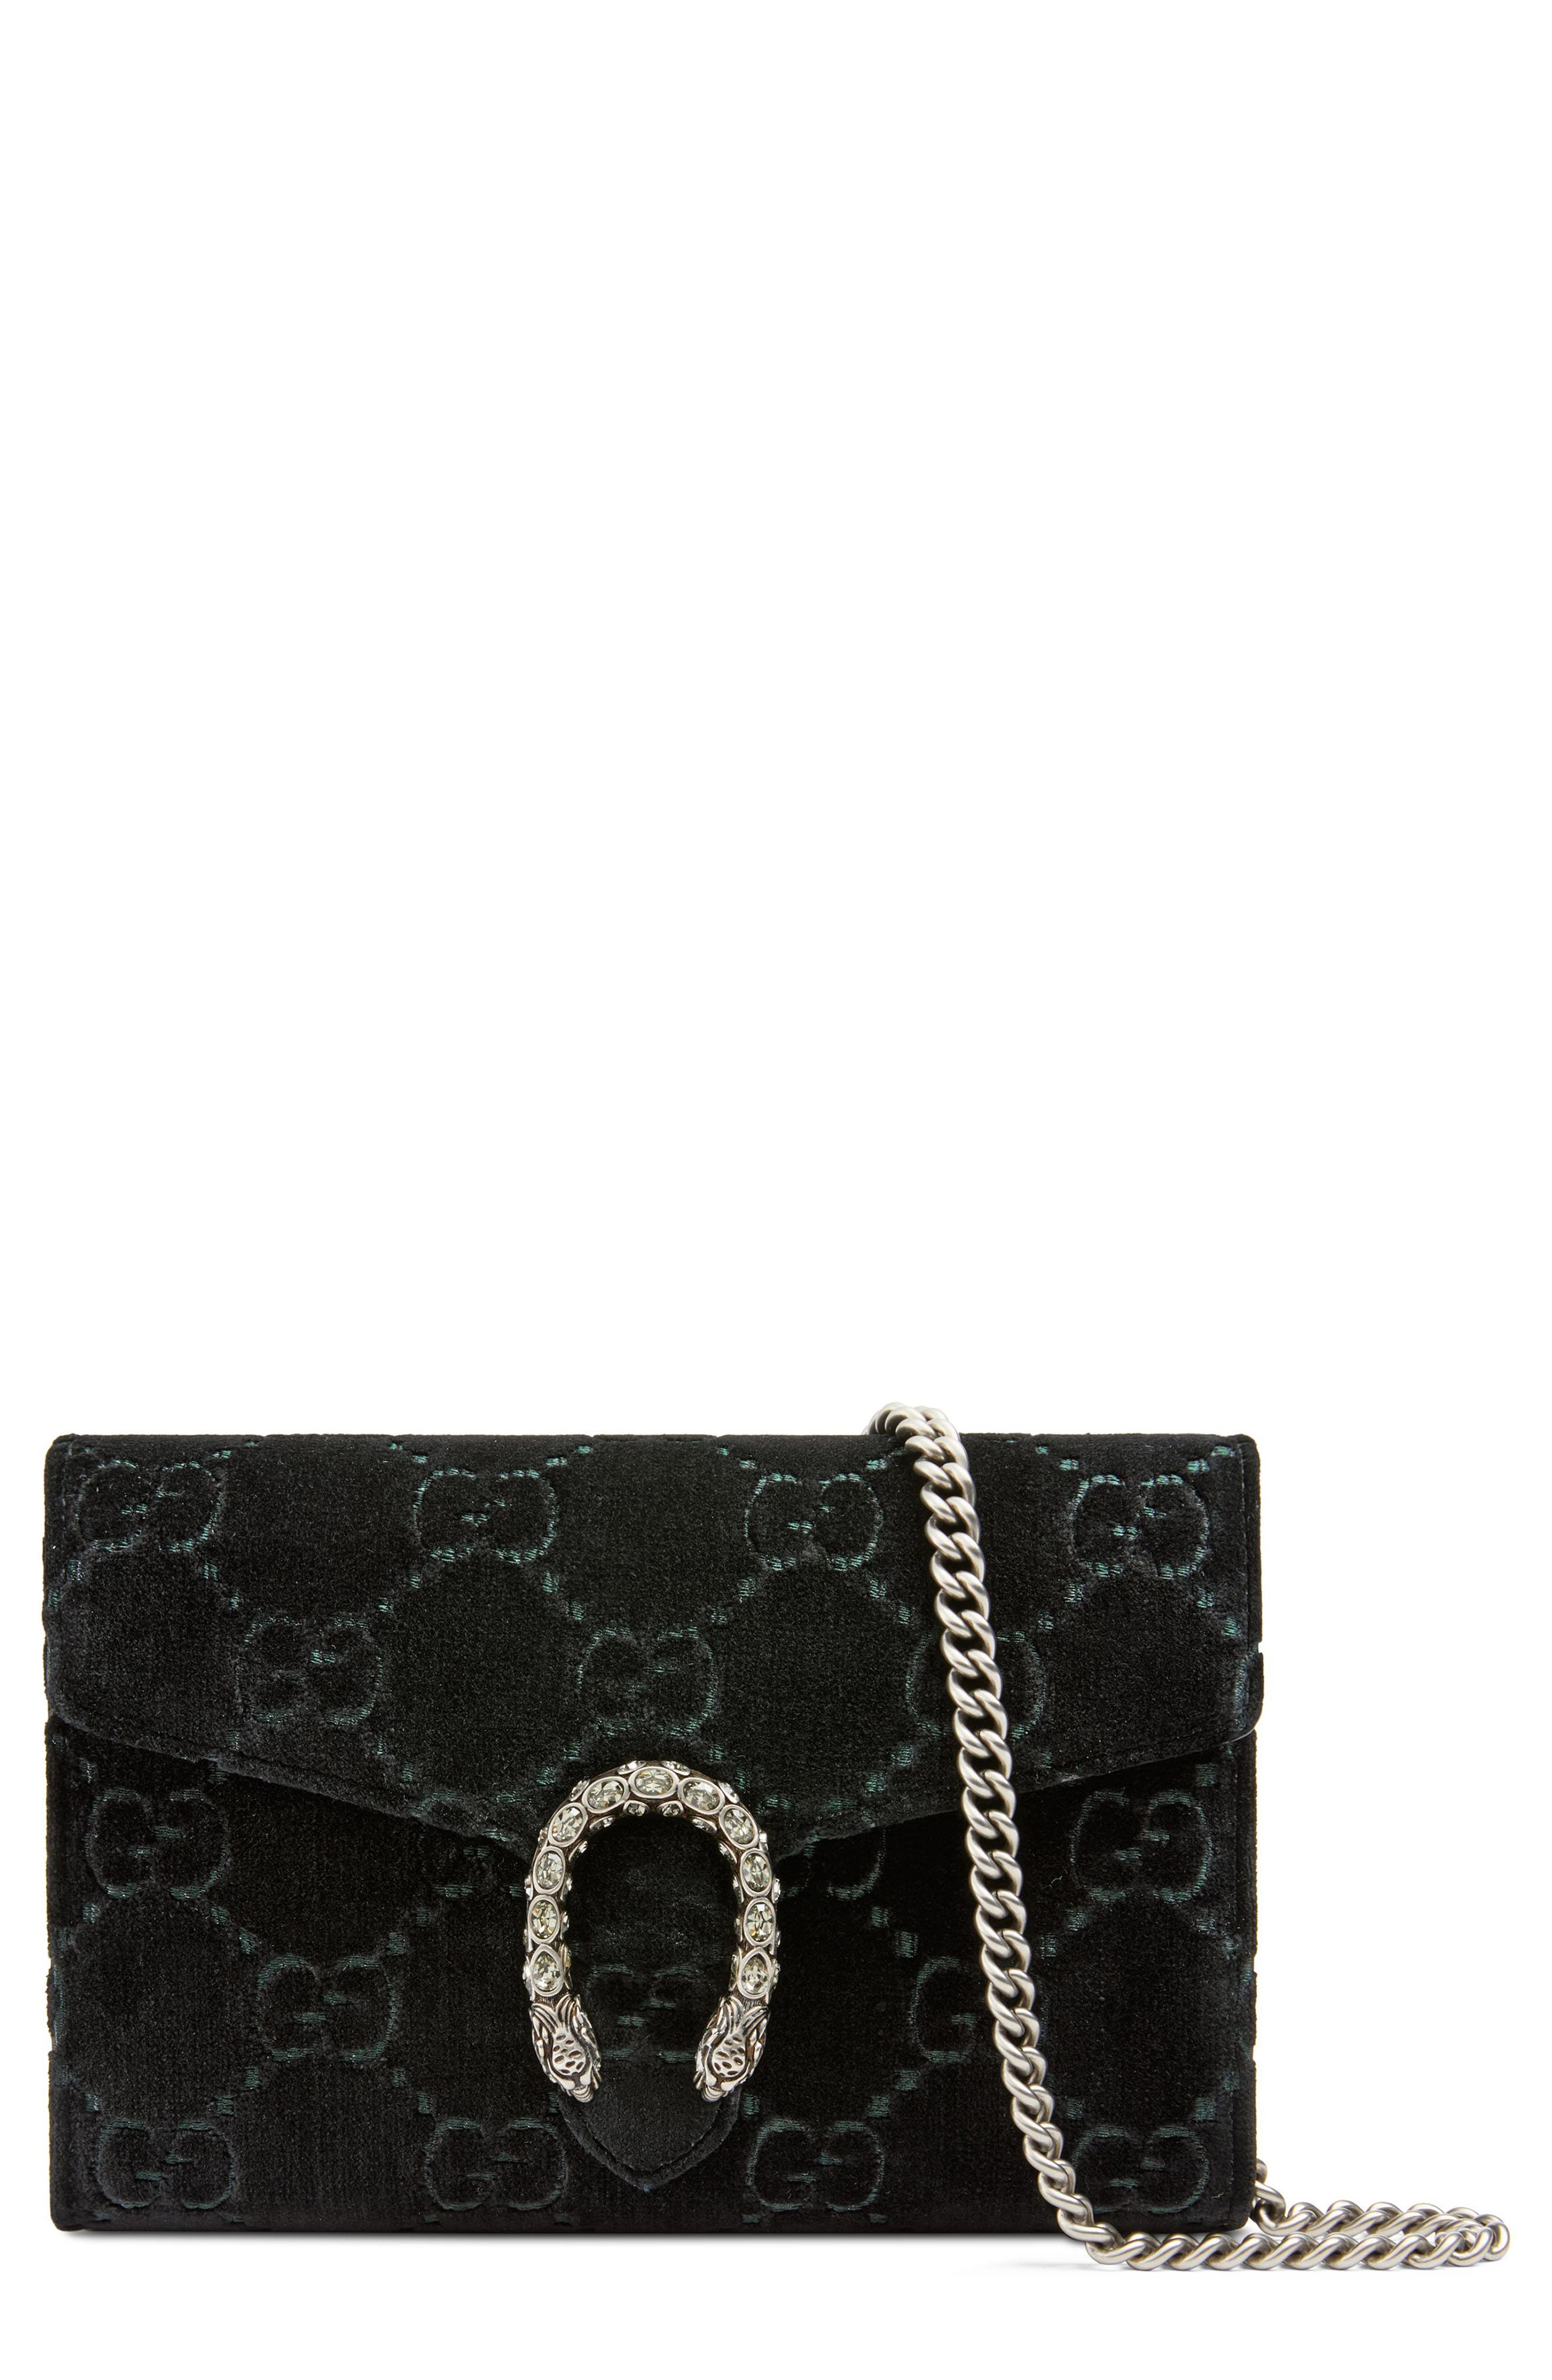 ba13a18e02bb Gucci Women s Wallets On A Chain Handbags